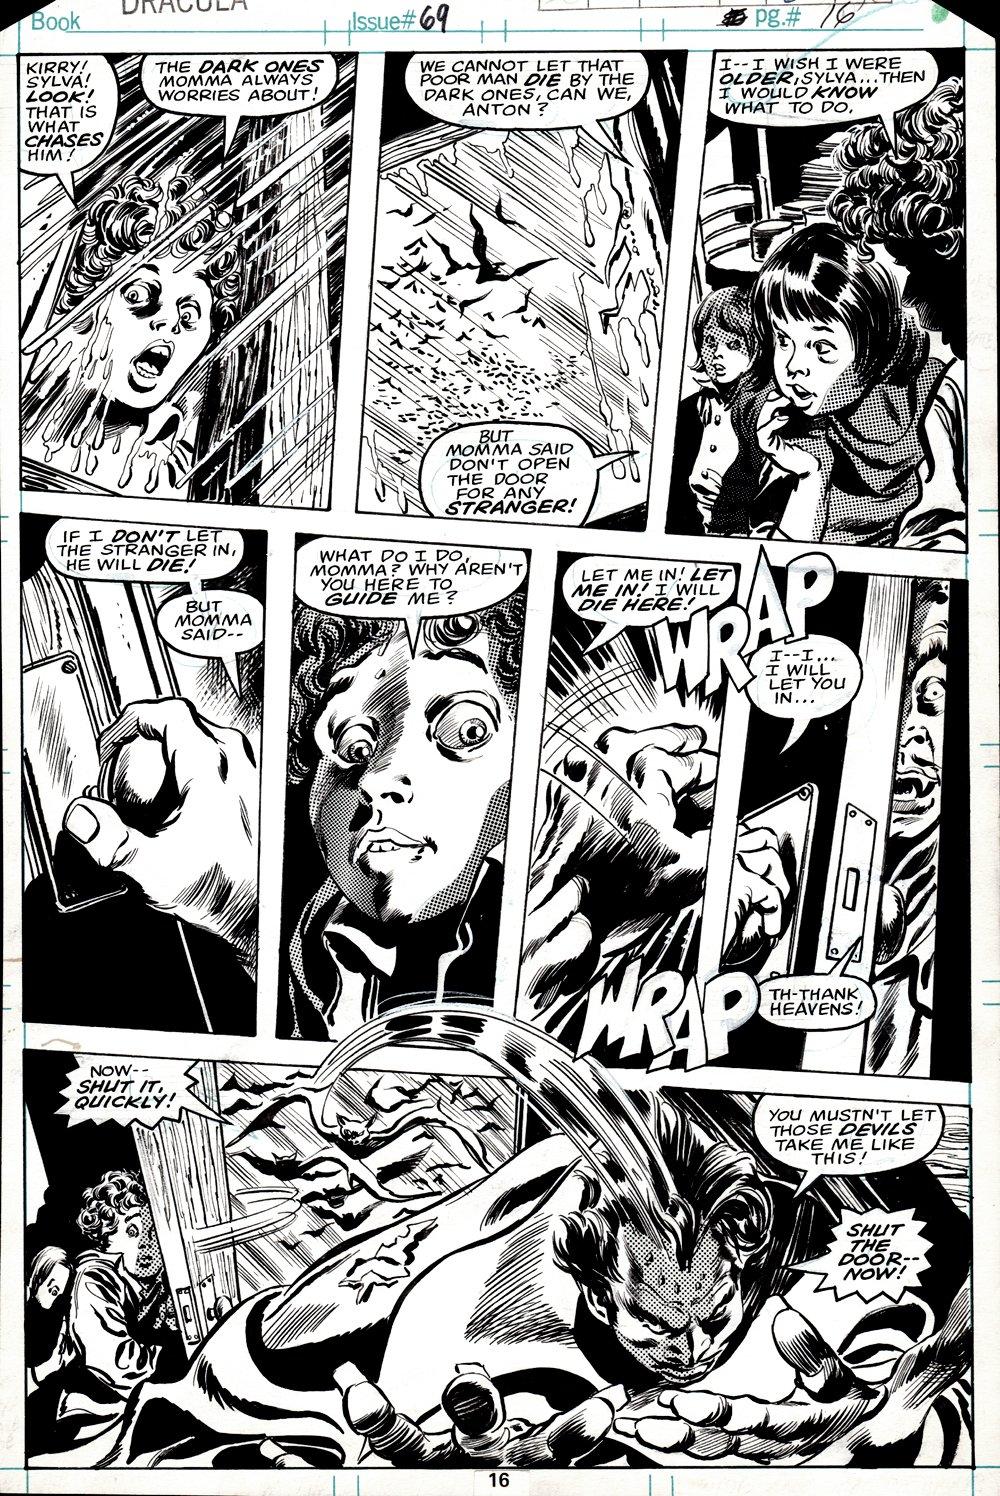 Tomb of Dracula #69 p 16 (DRACULA THROUGHOUT!) 1978